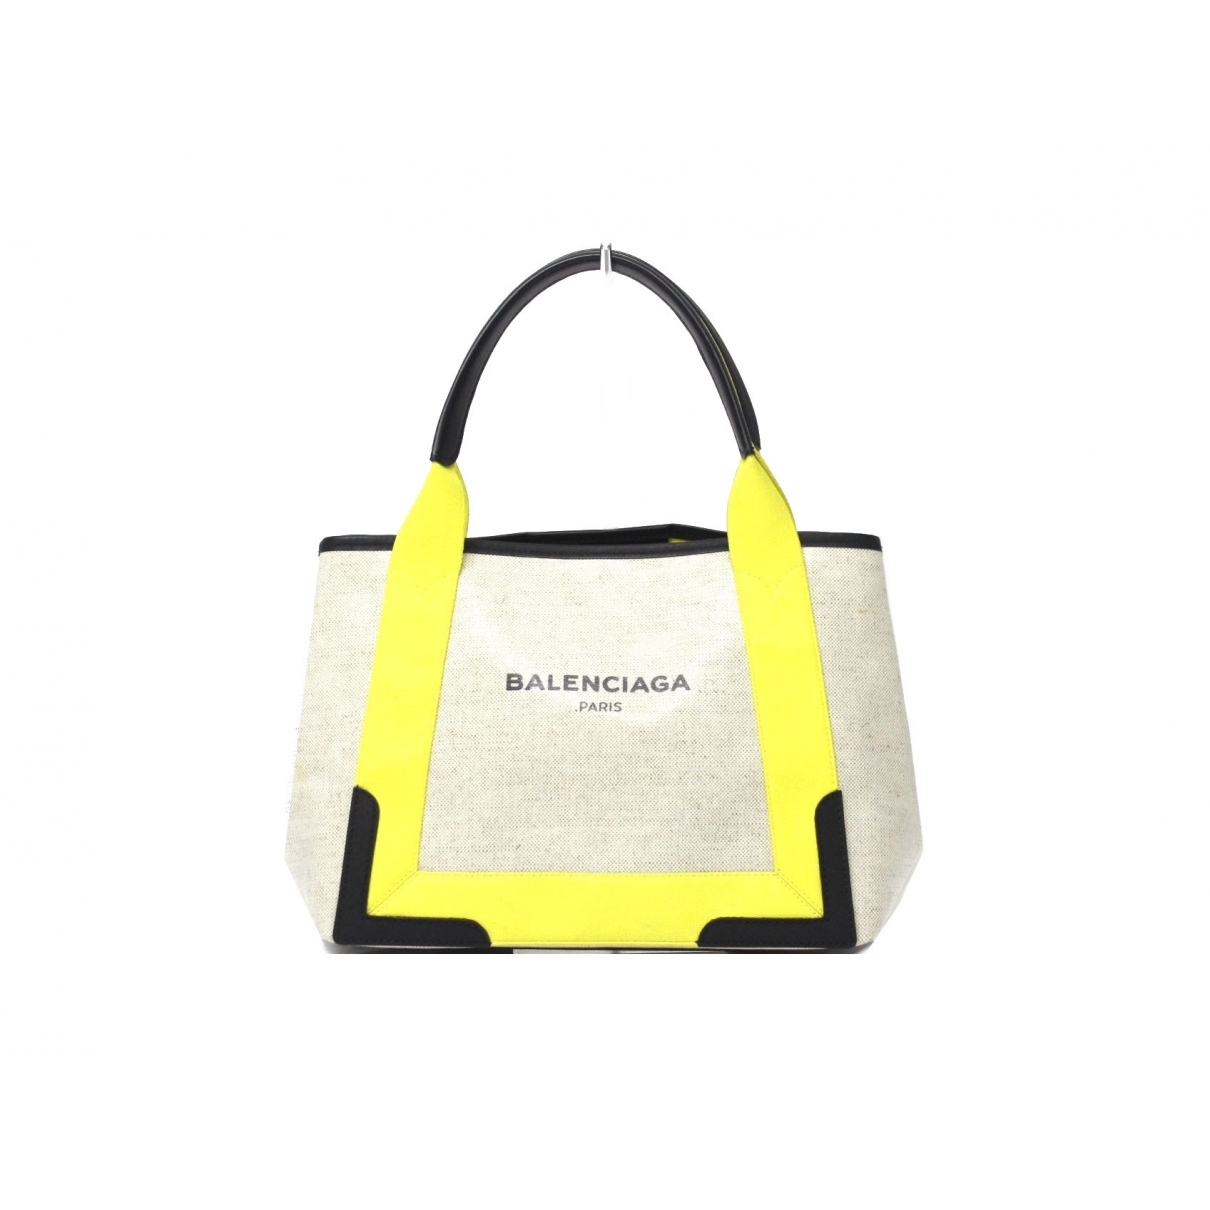 Balenciaga \N Handtasche in Leinen